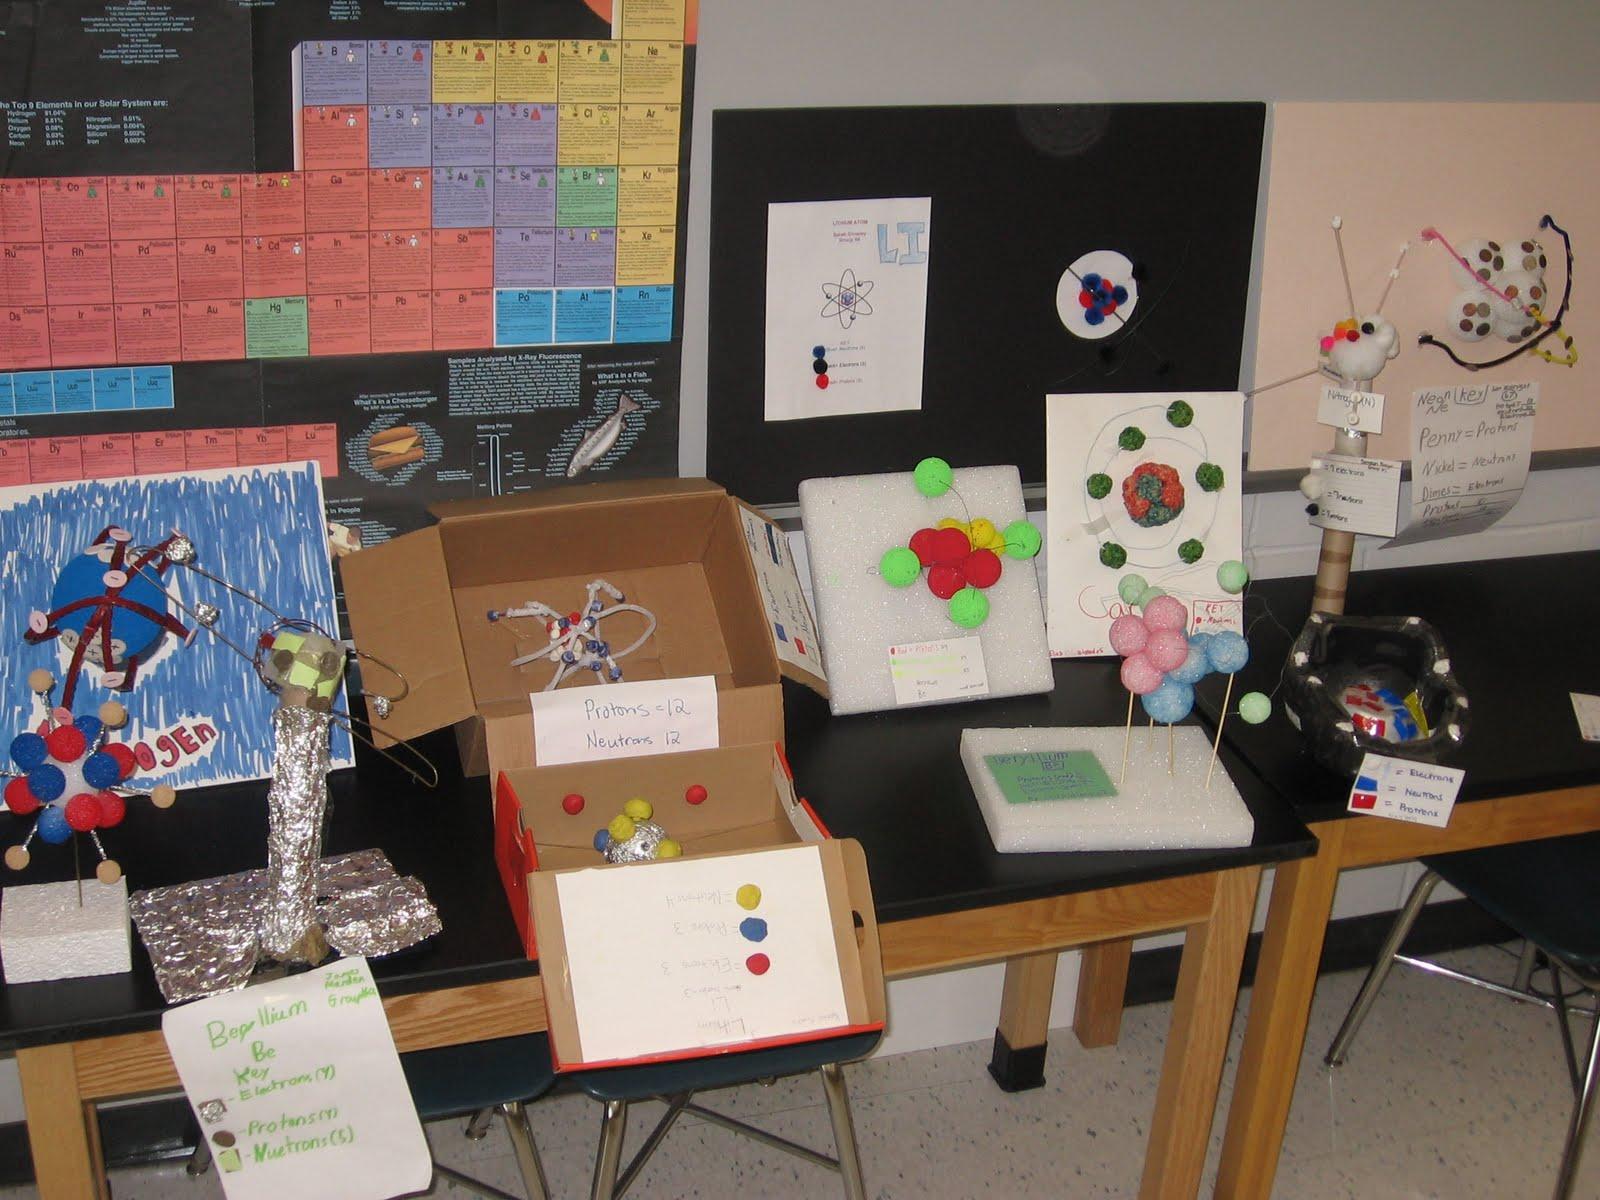 Mr. Williams 6th Grade Science Blog: May 2010